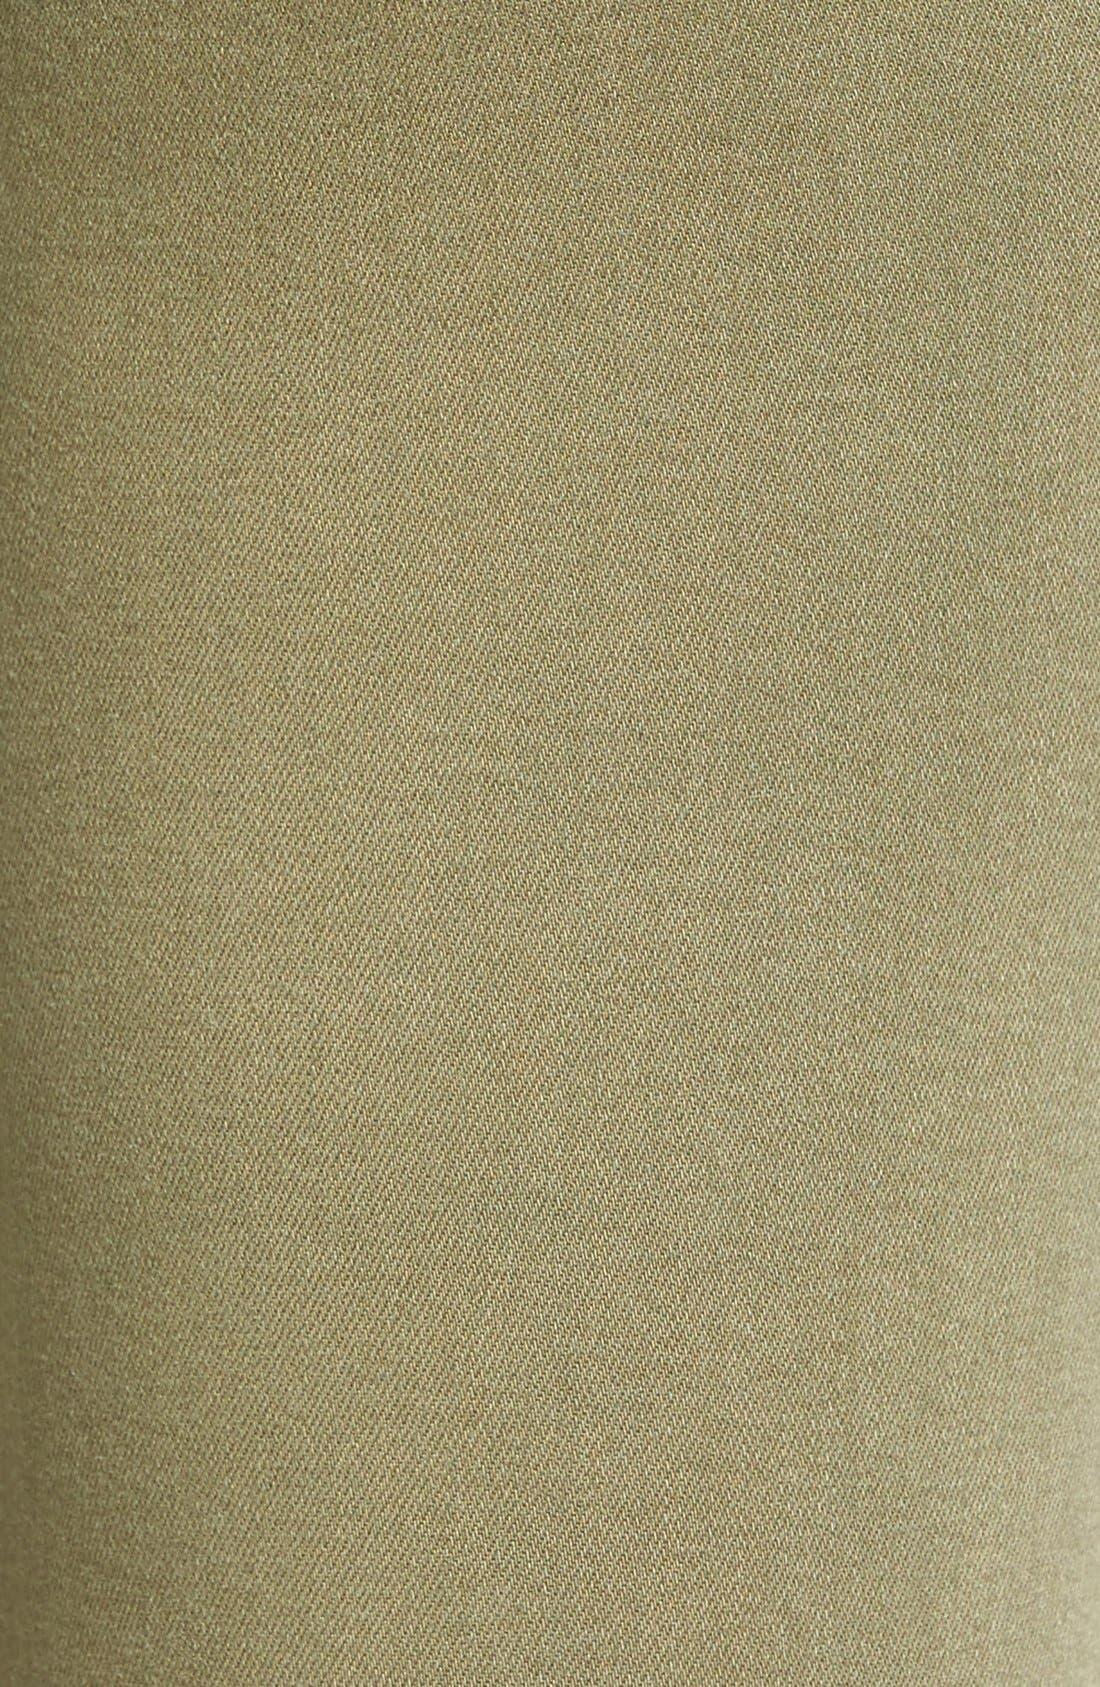 Transcend - Verdugo Ankle Skinny Jeans,                             Alternate thumbnail 4, color,                             Sahara Green